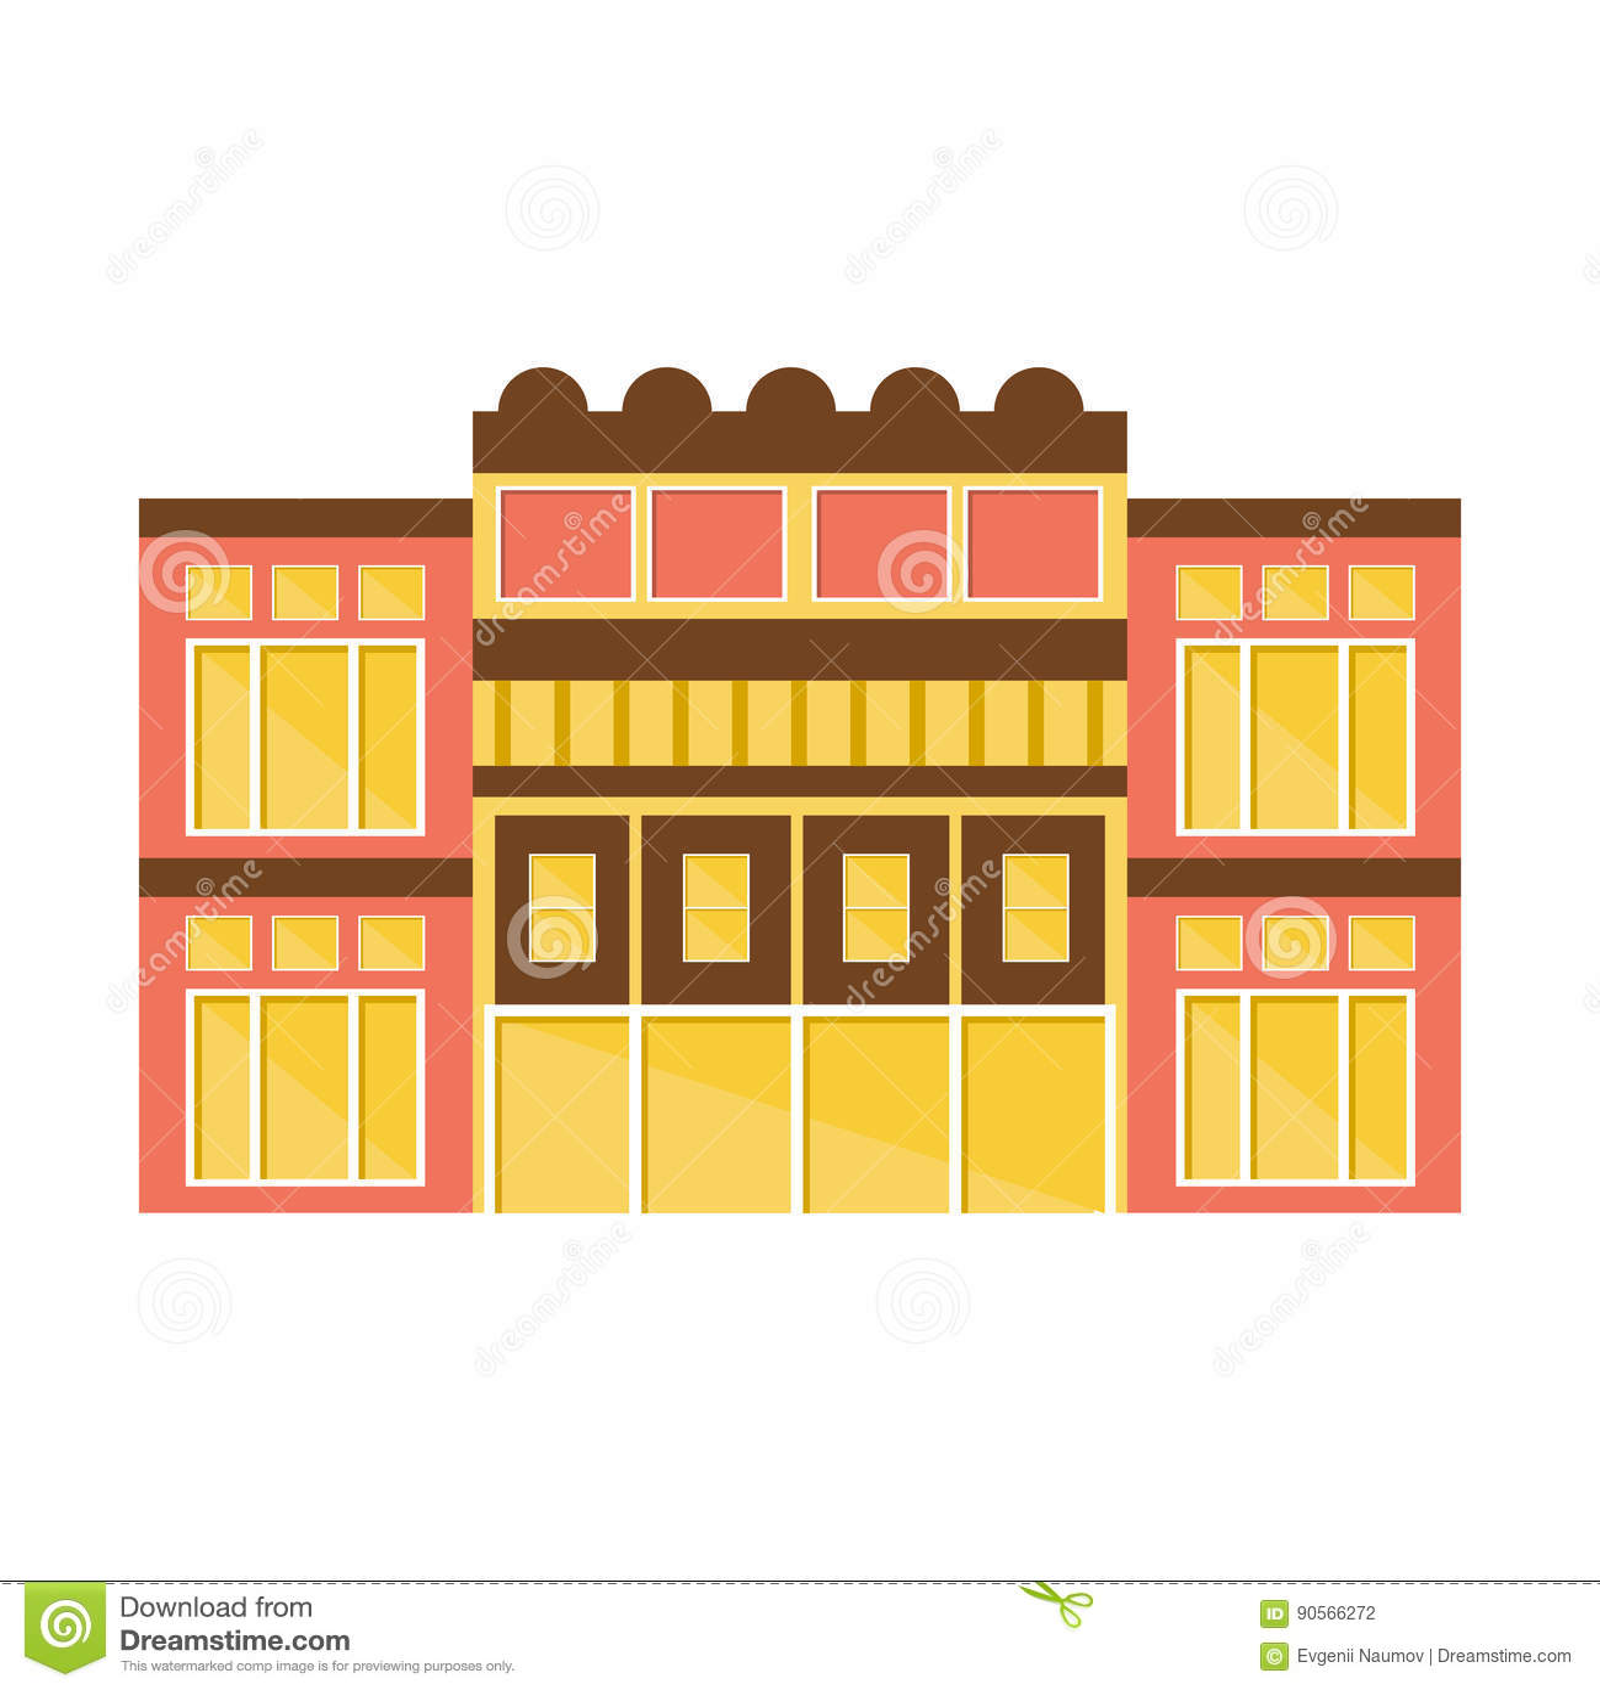 Clssical桃红色和黄色商城现代大厦外部设计项目模板被隔绝的平的例证